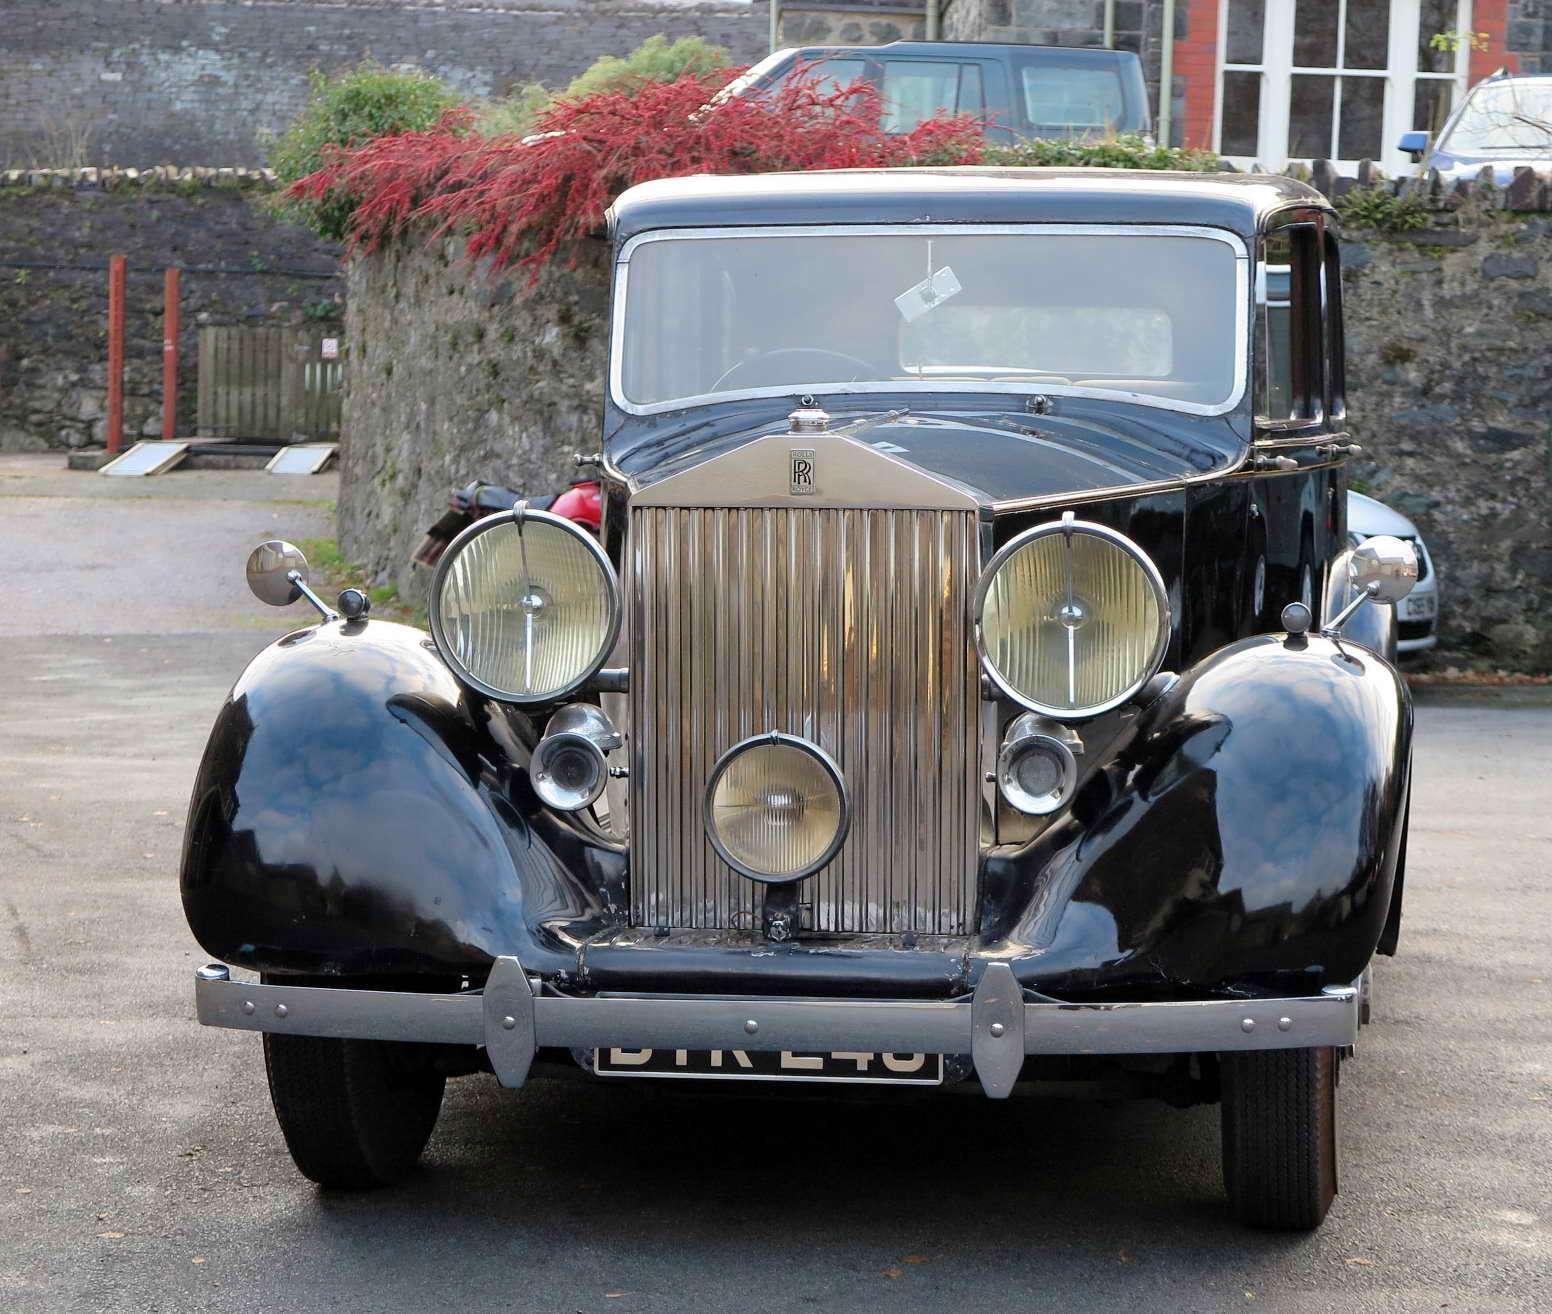 1939 Rolls-Royce Wraith Hooper Limousine